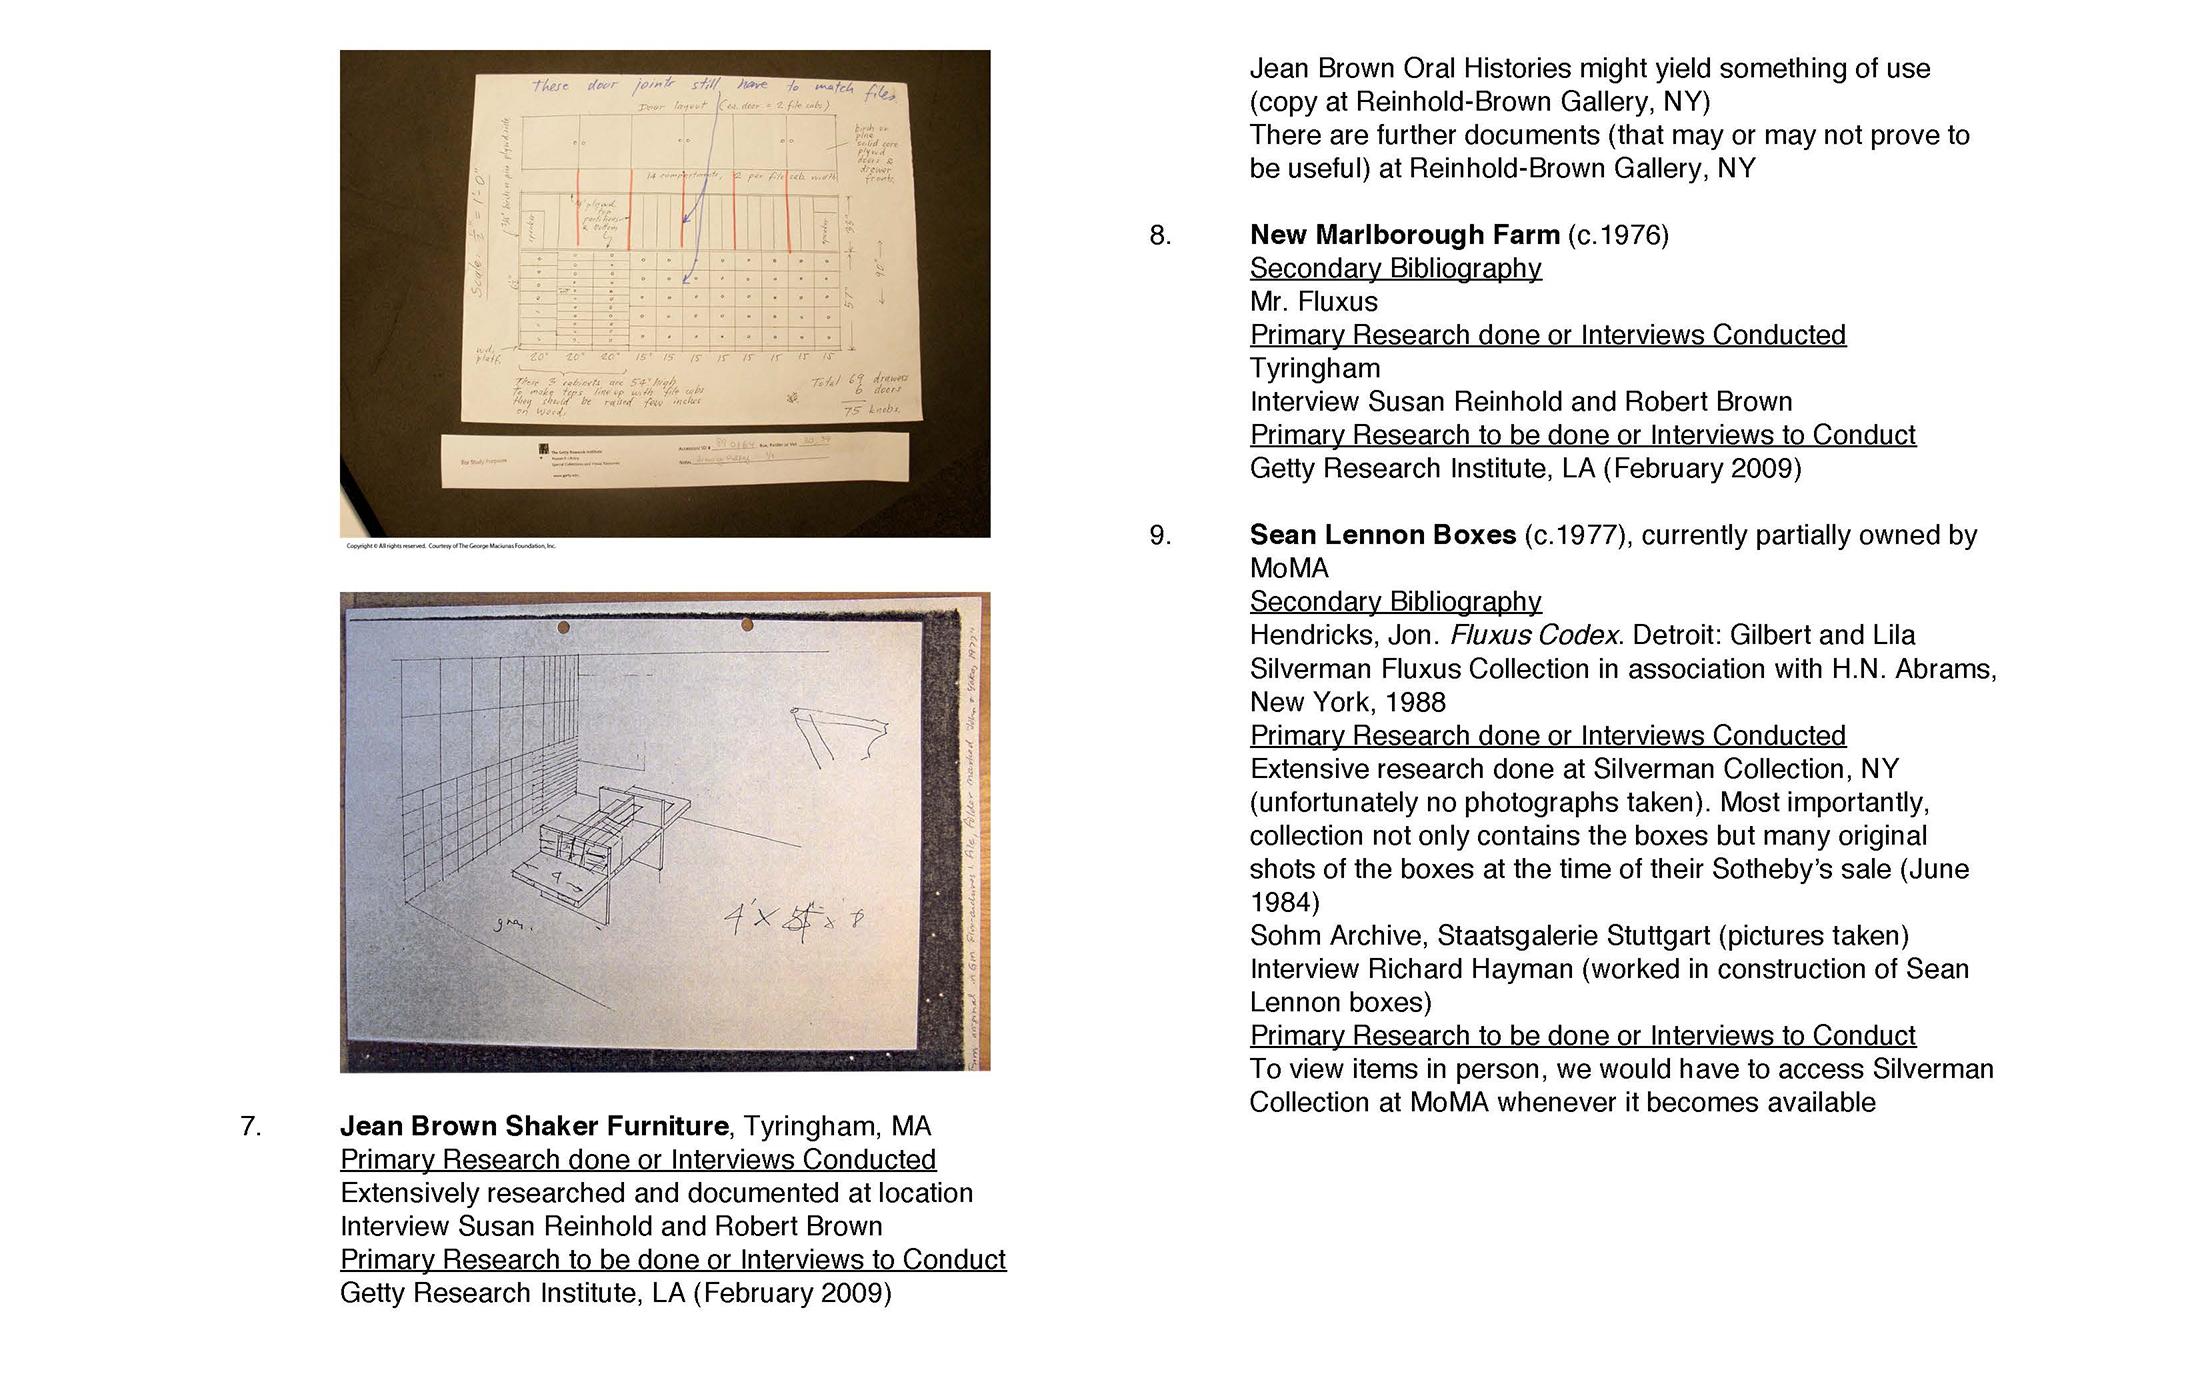 Maciunas Assessment Report 0509_Page_83.jpg